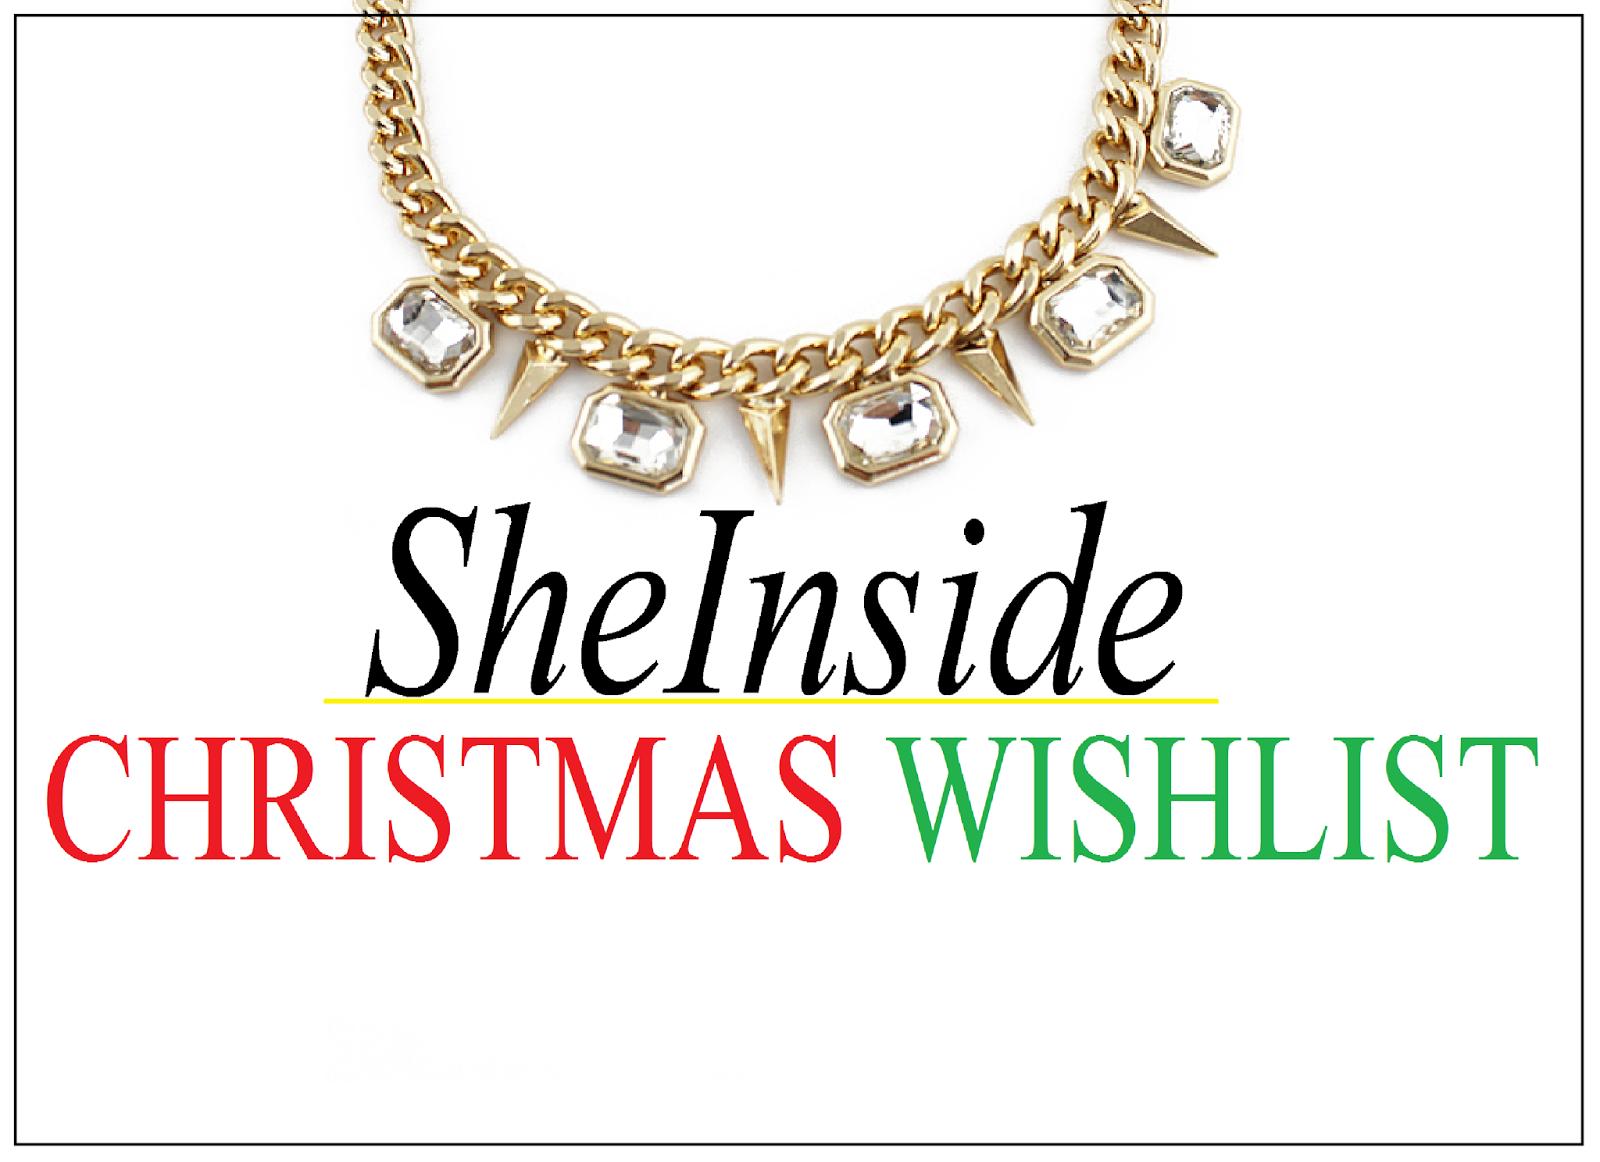 sheinside wishlist